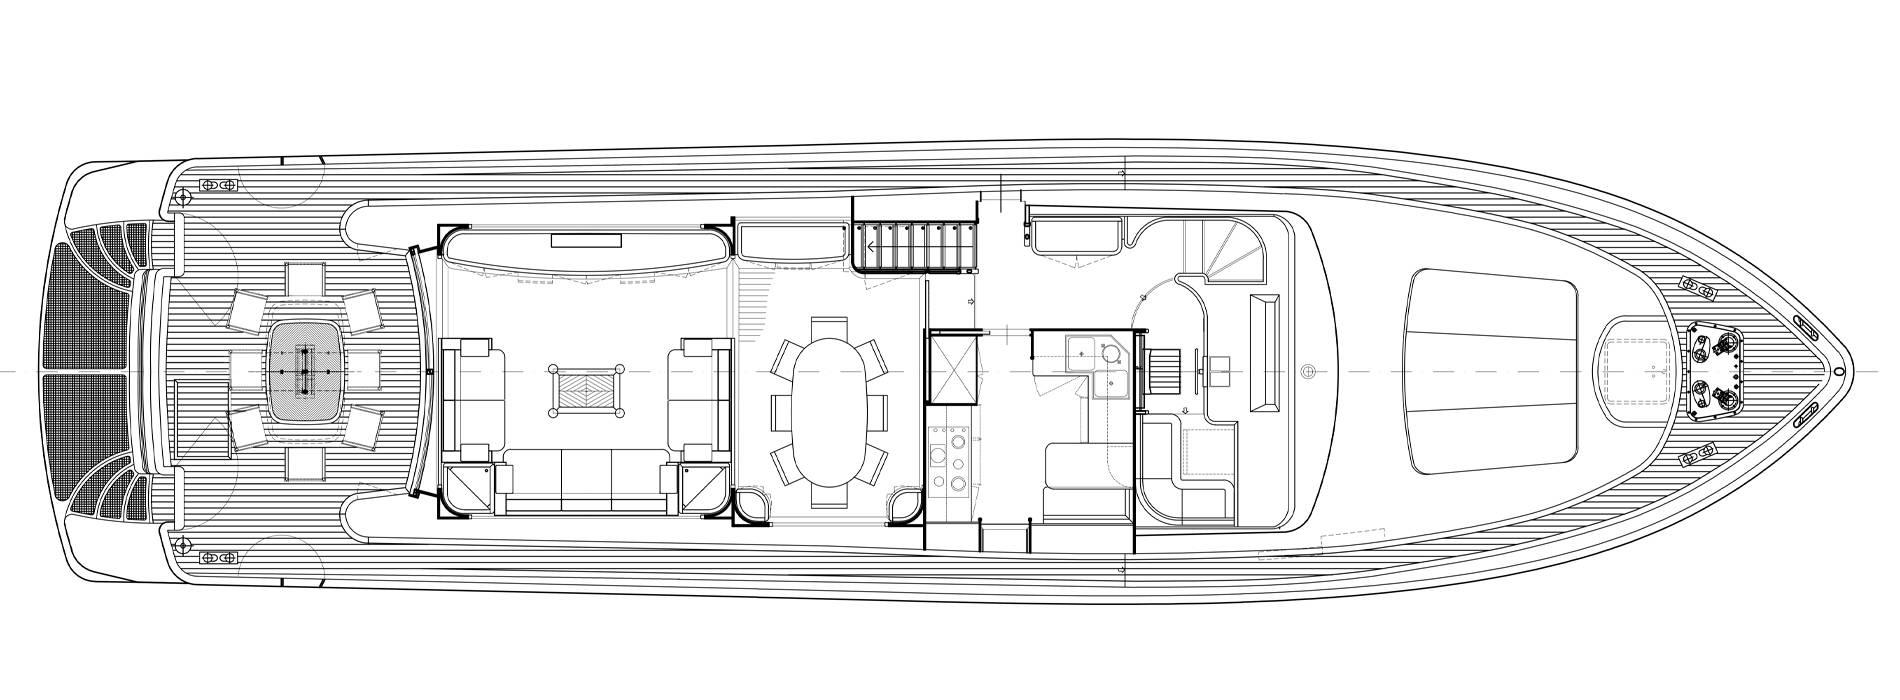 Sanlorenzo Yachts SL82-469 Mazuki Main Deck